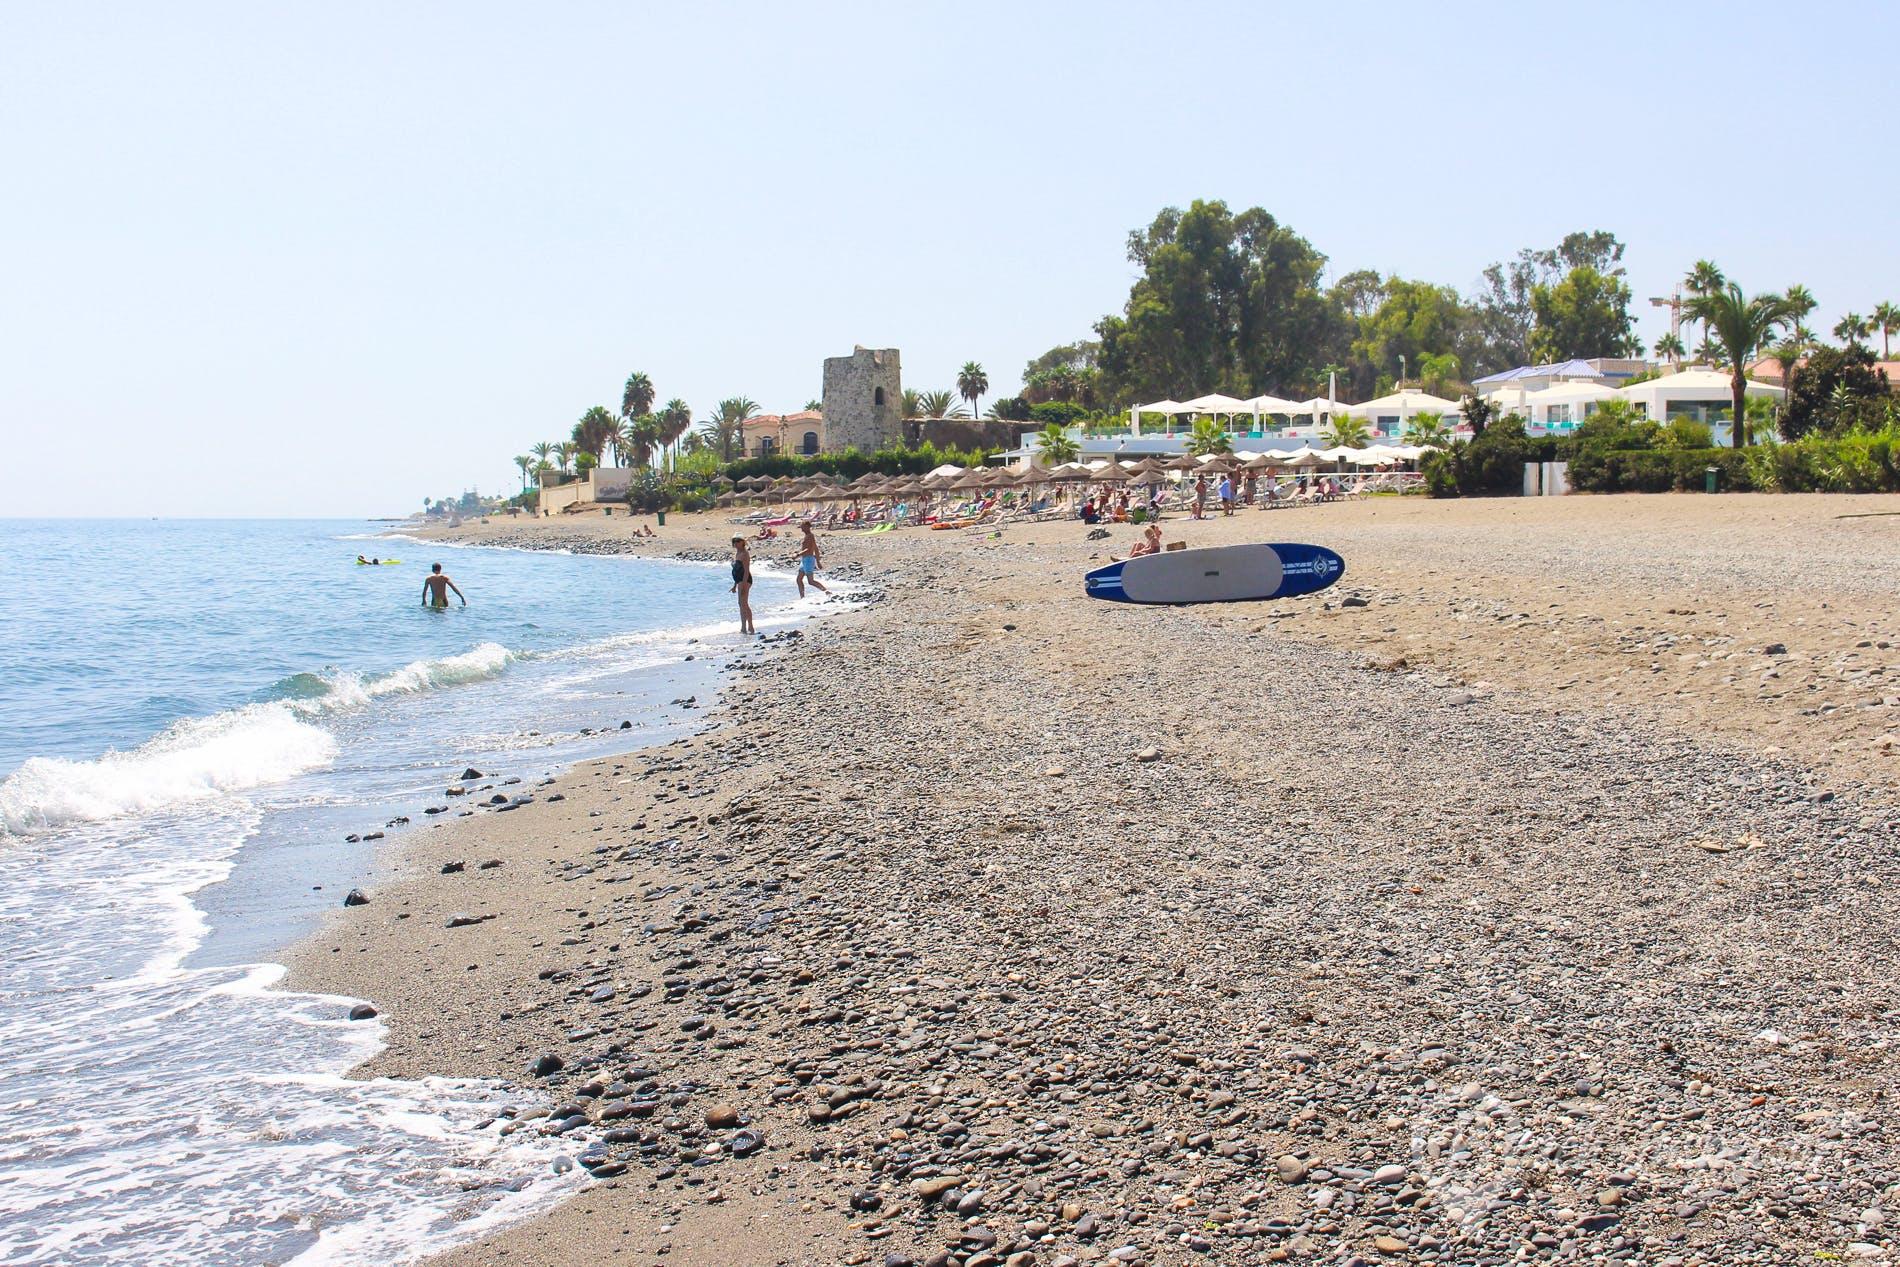 Beach Playa de Lindavista, Costa del Sol, Spain